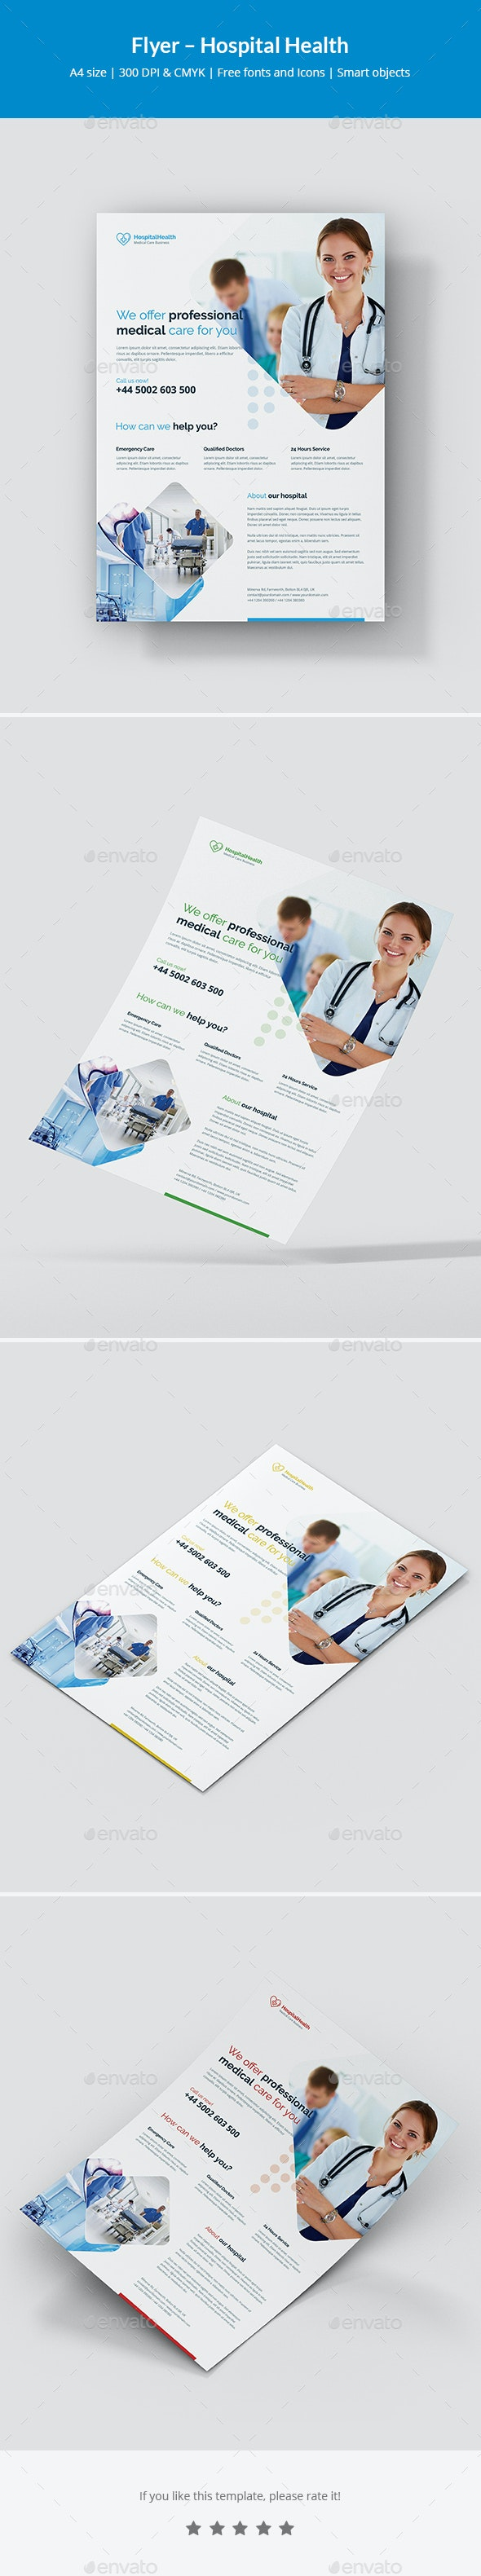 Flyer – Hospital Health - Corporate Flyers